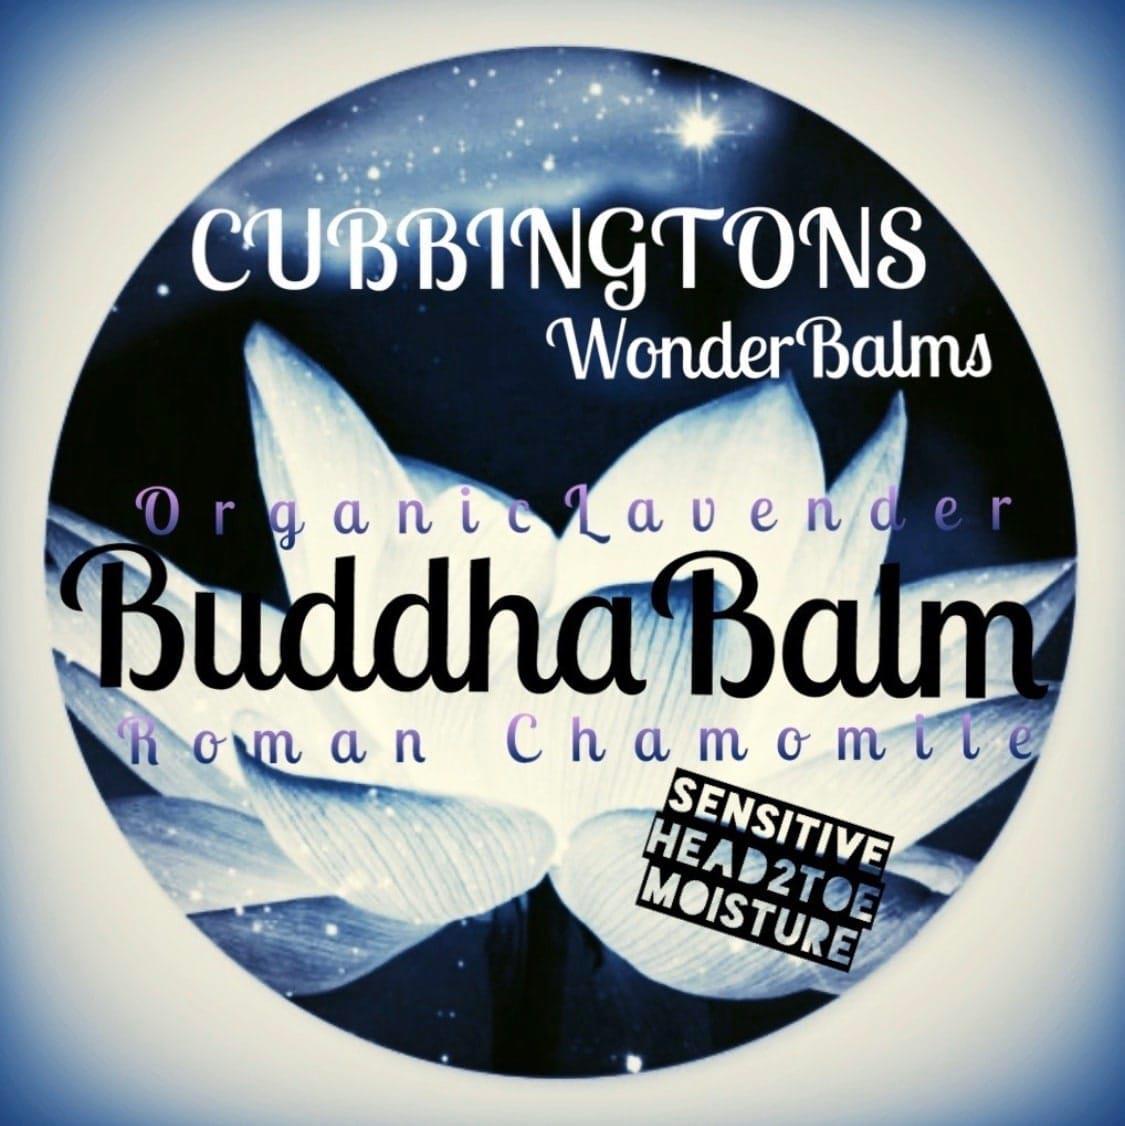 CubbingtonsWonderBalms Alton 07723 344426